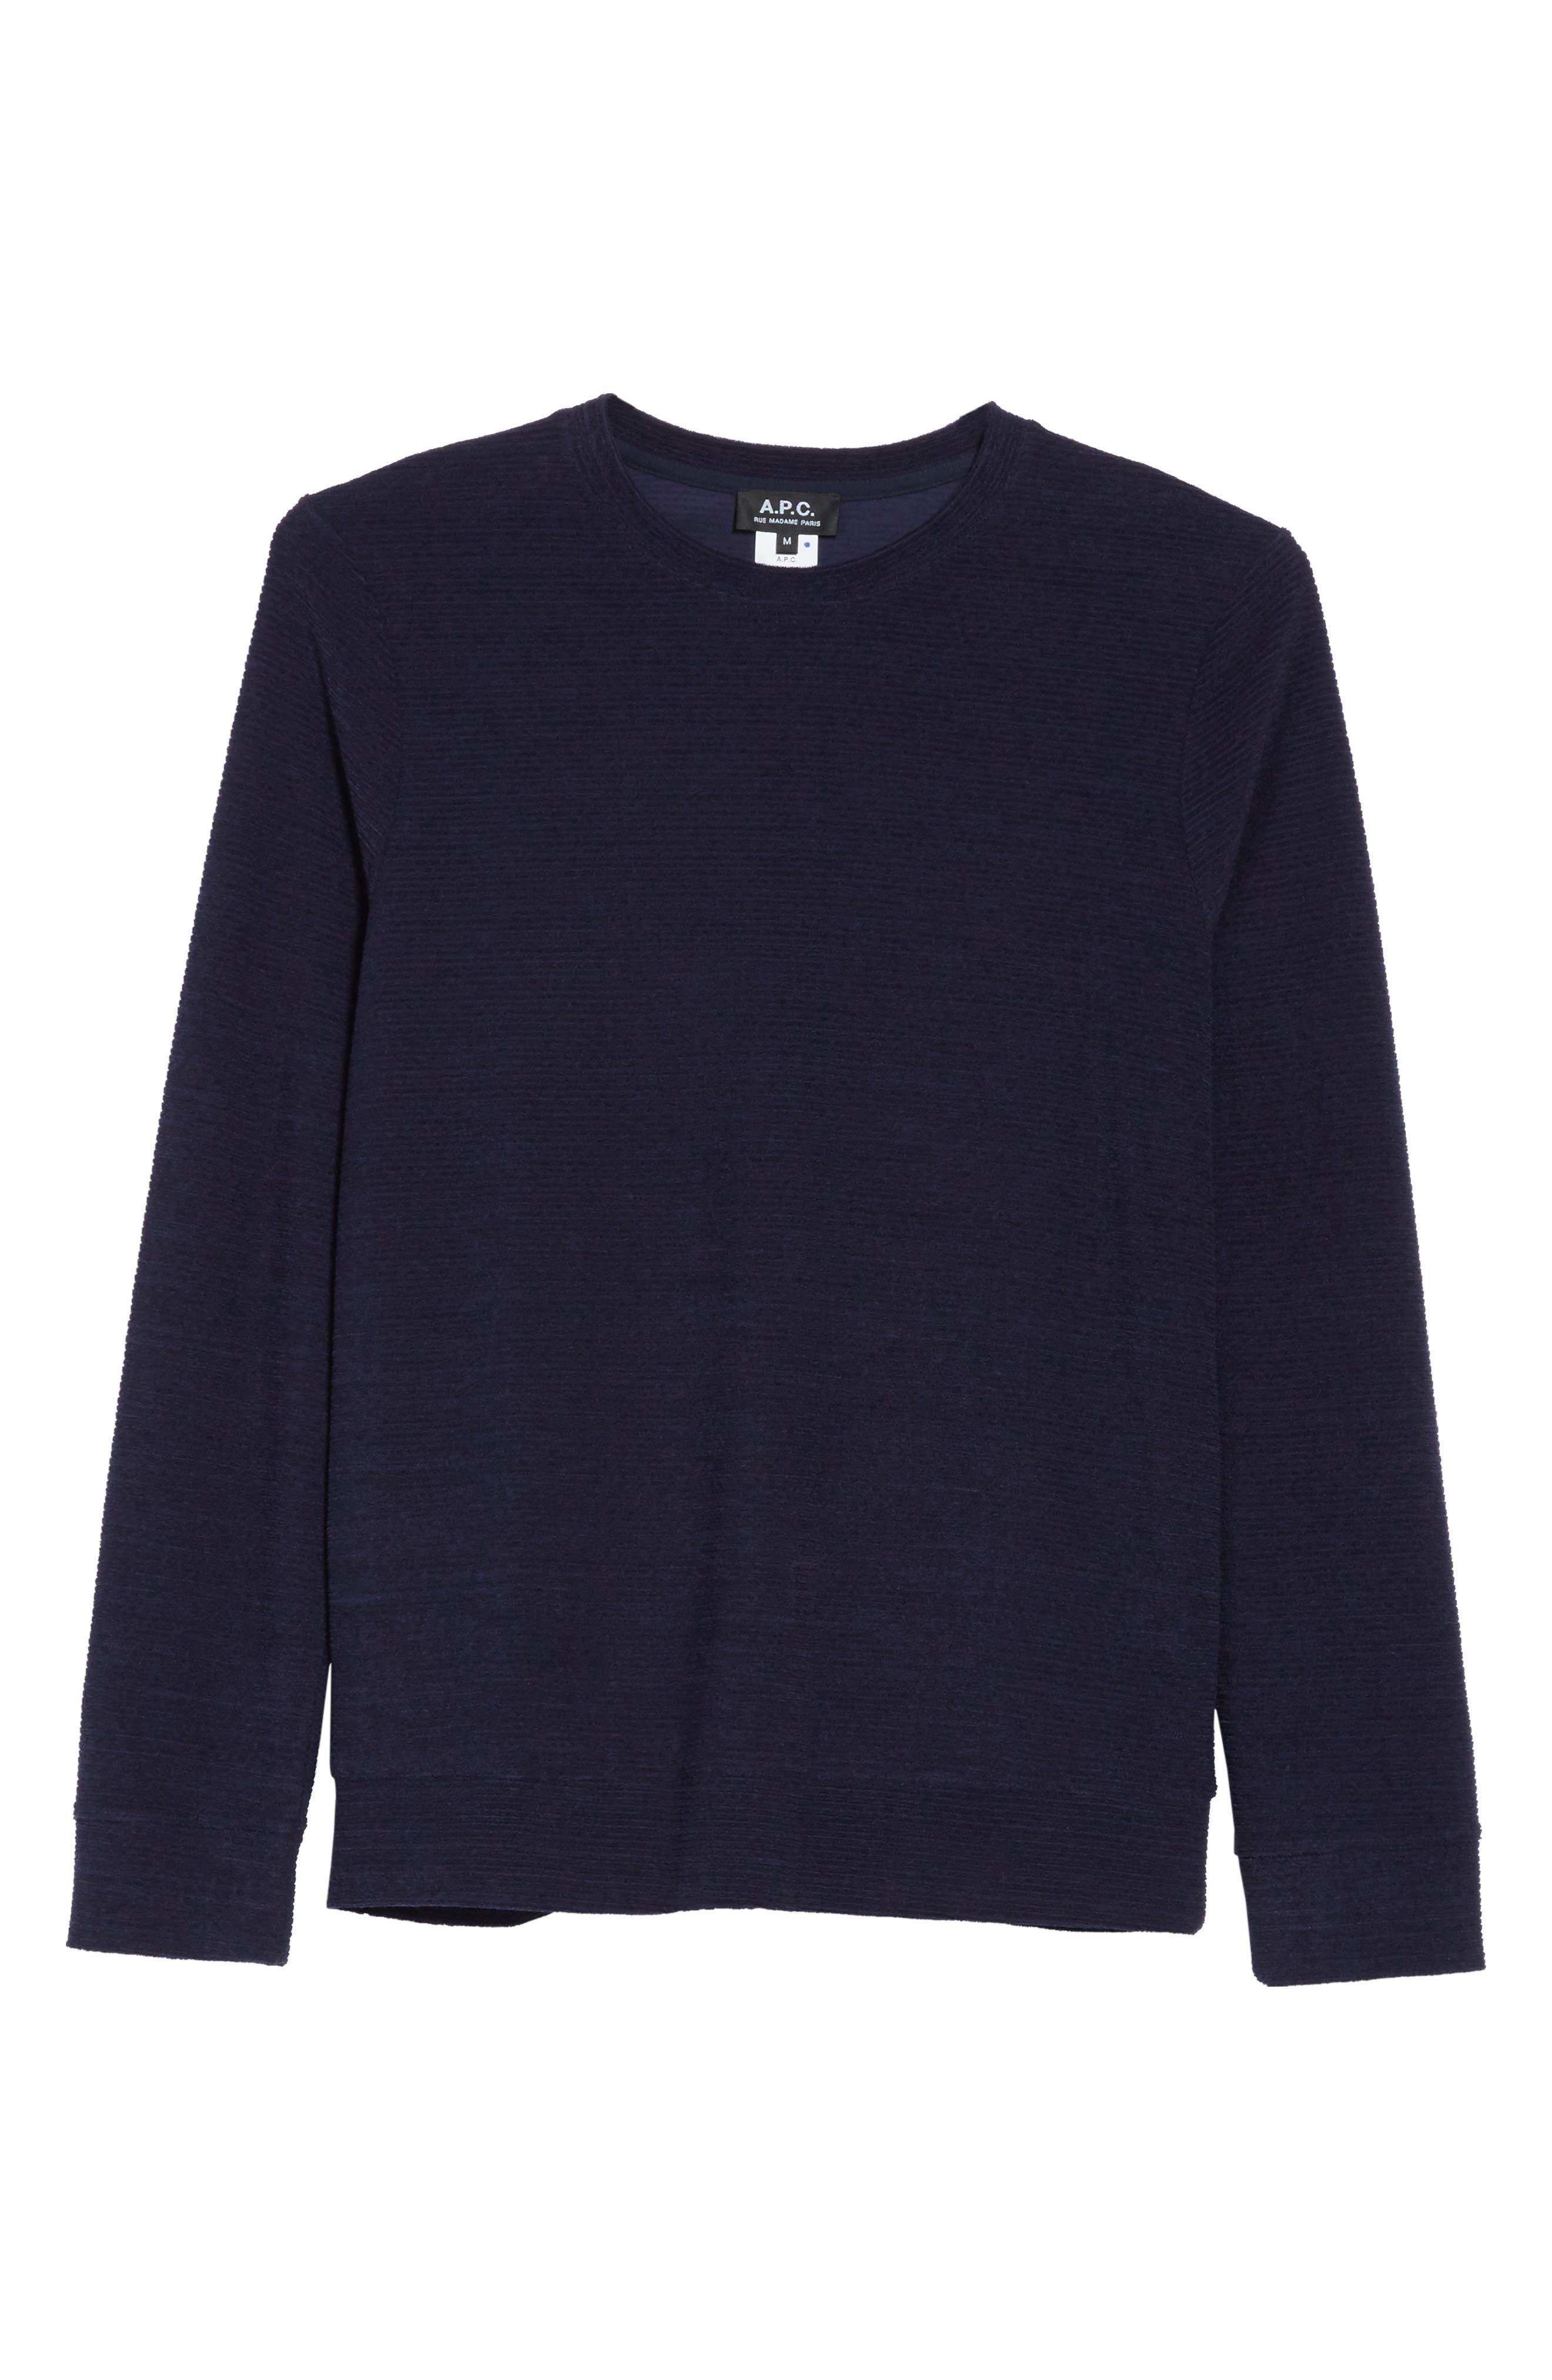 Jeremie Crewneck Sweater,                             Alternate thumbnail 6, color,